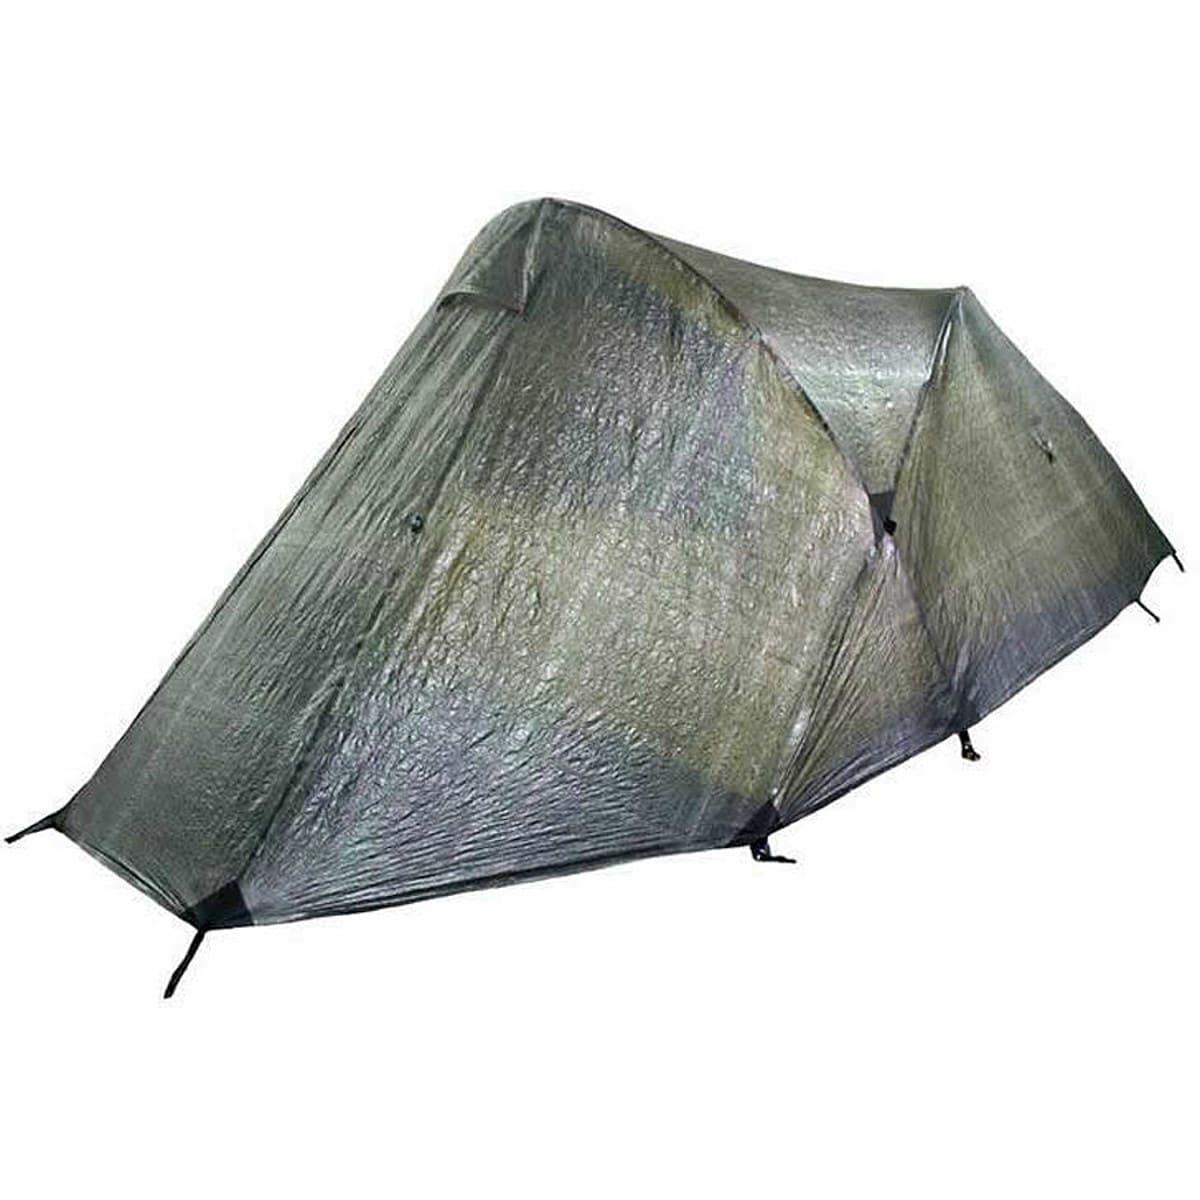 photo: Terra Nova Voyager Ultra 2 Tent